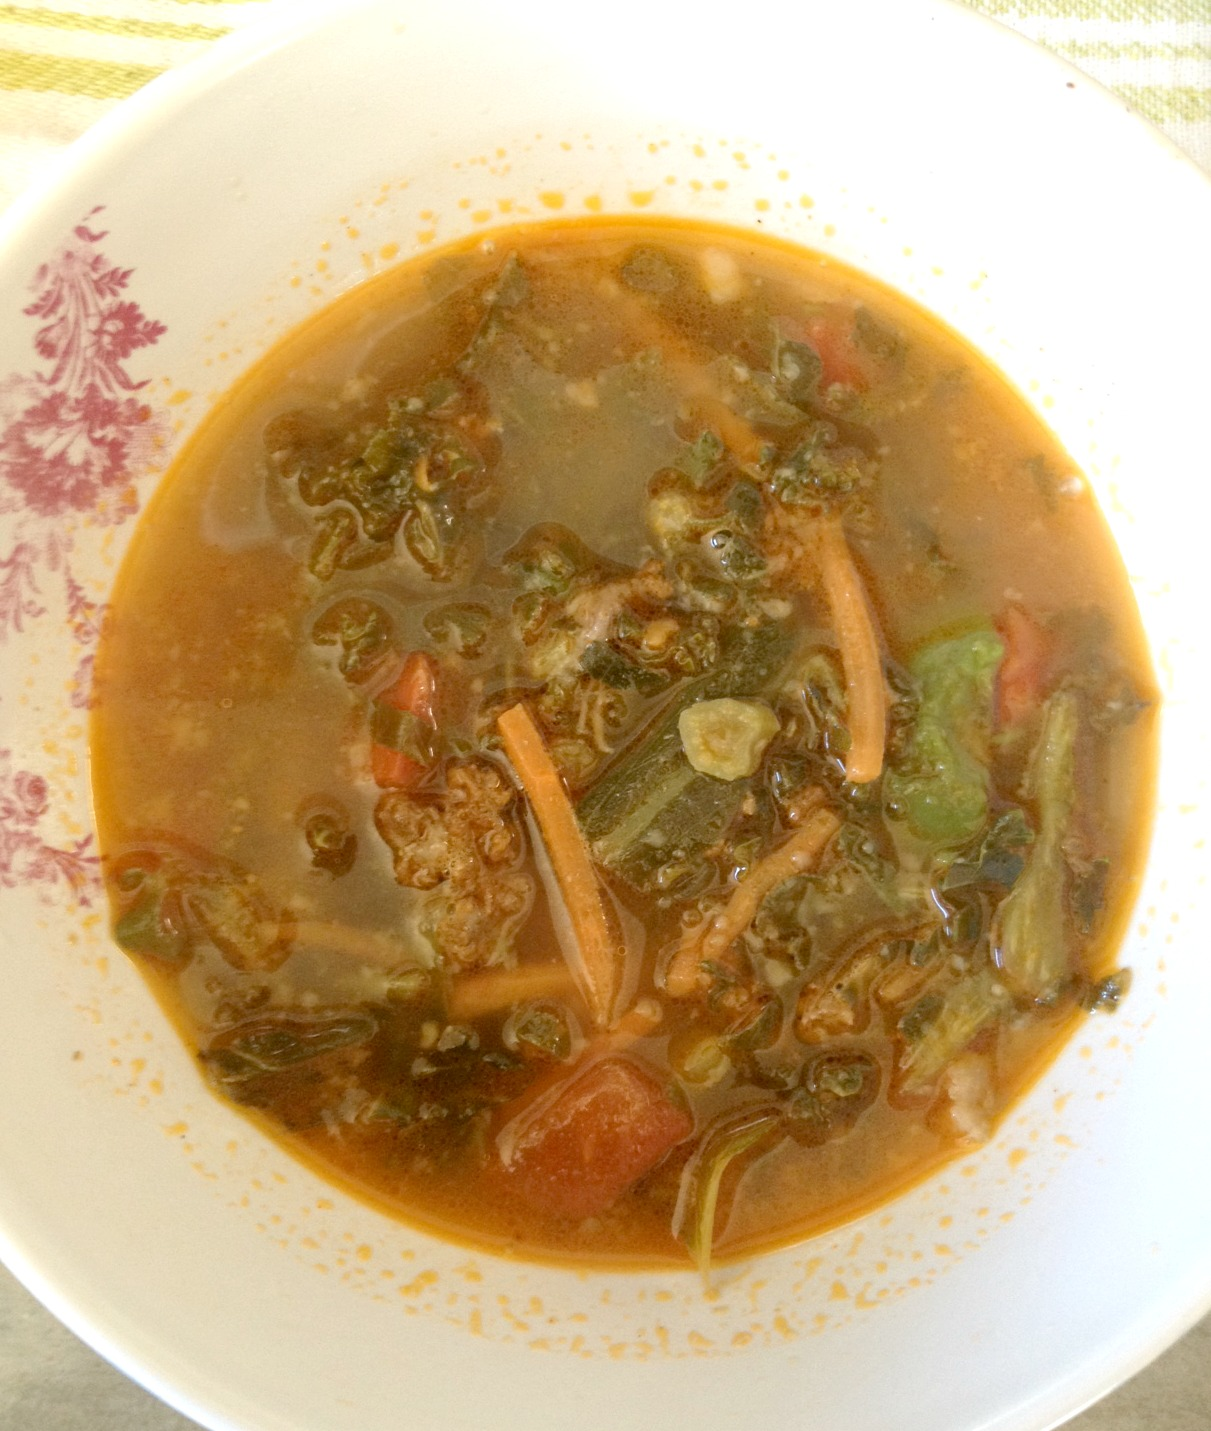 3 Bone broth recipes to heal digestion